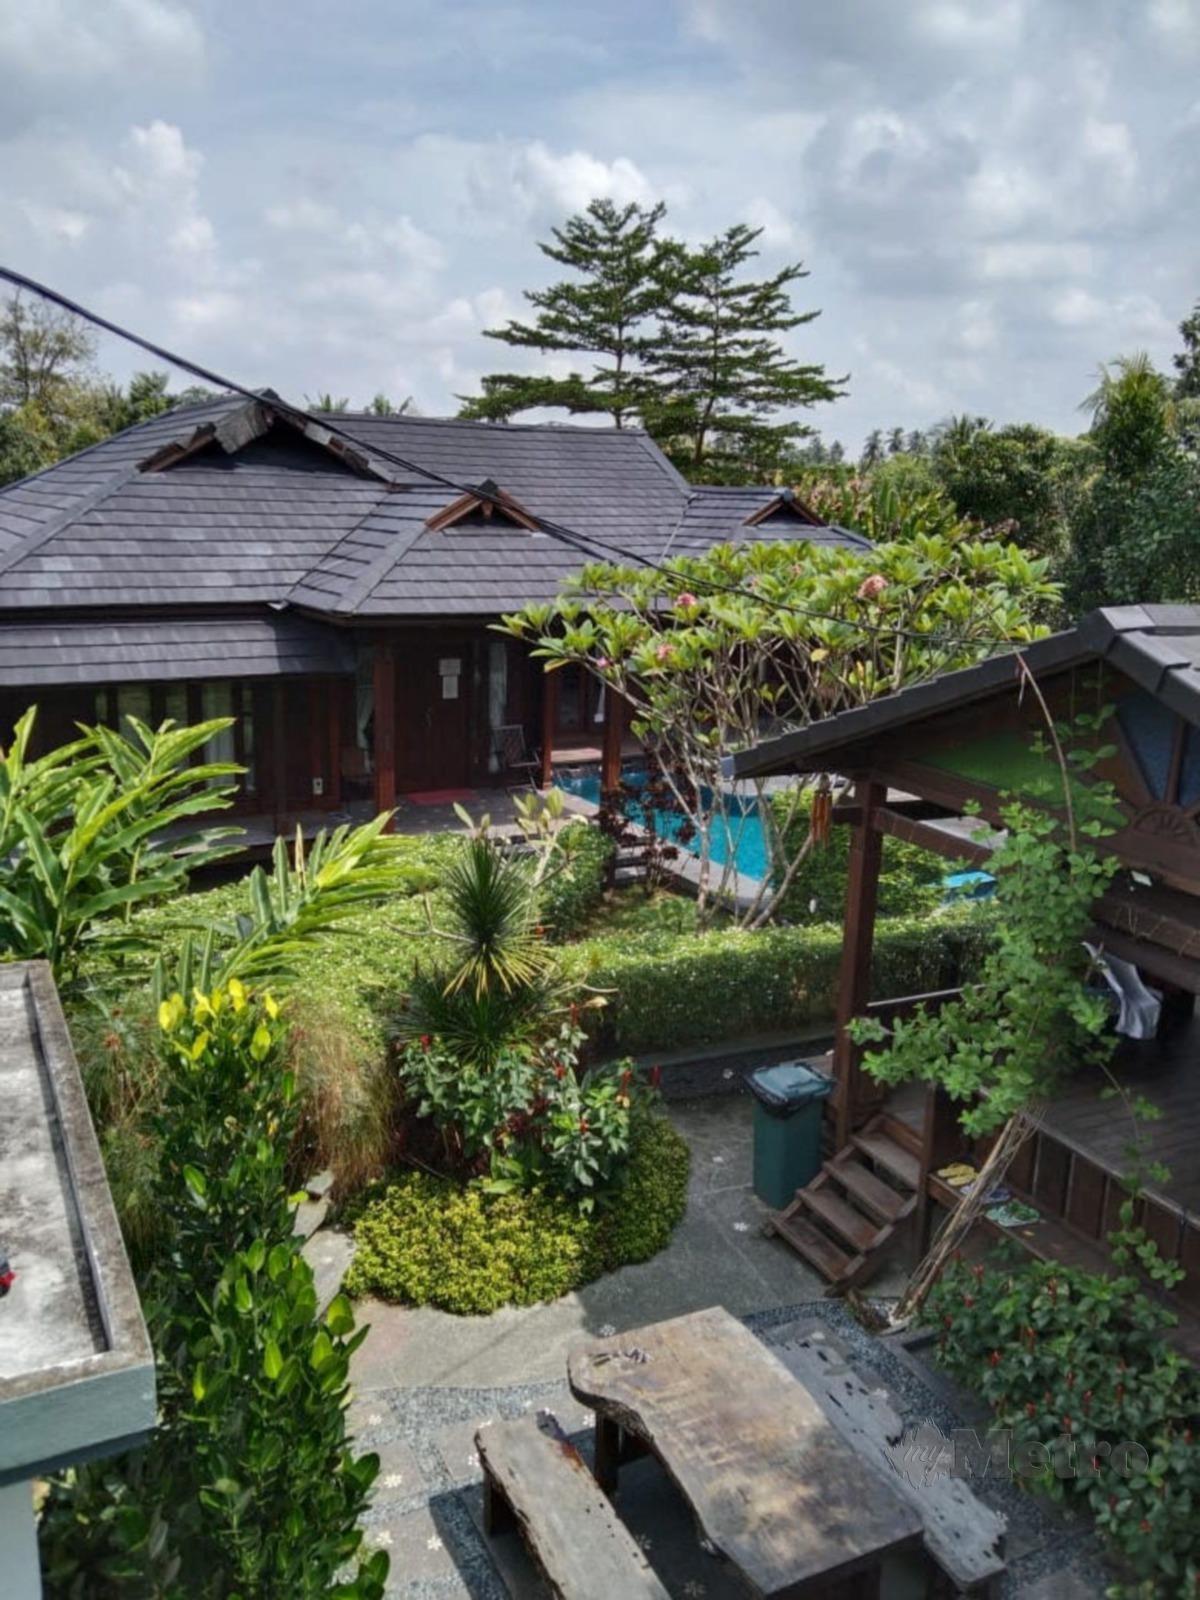 PEMANDANGAN landskap juga inspirasi Bali.